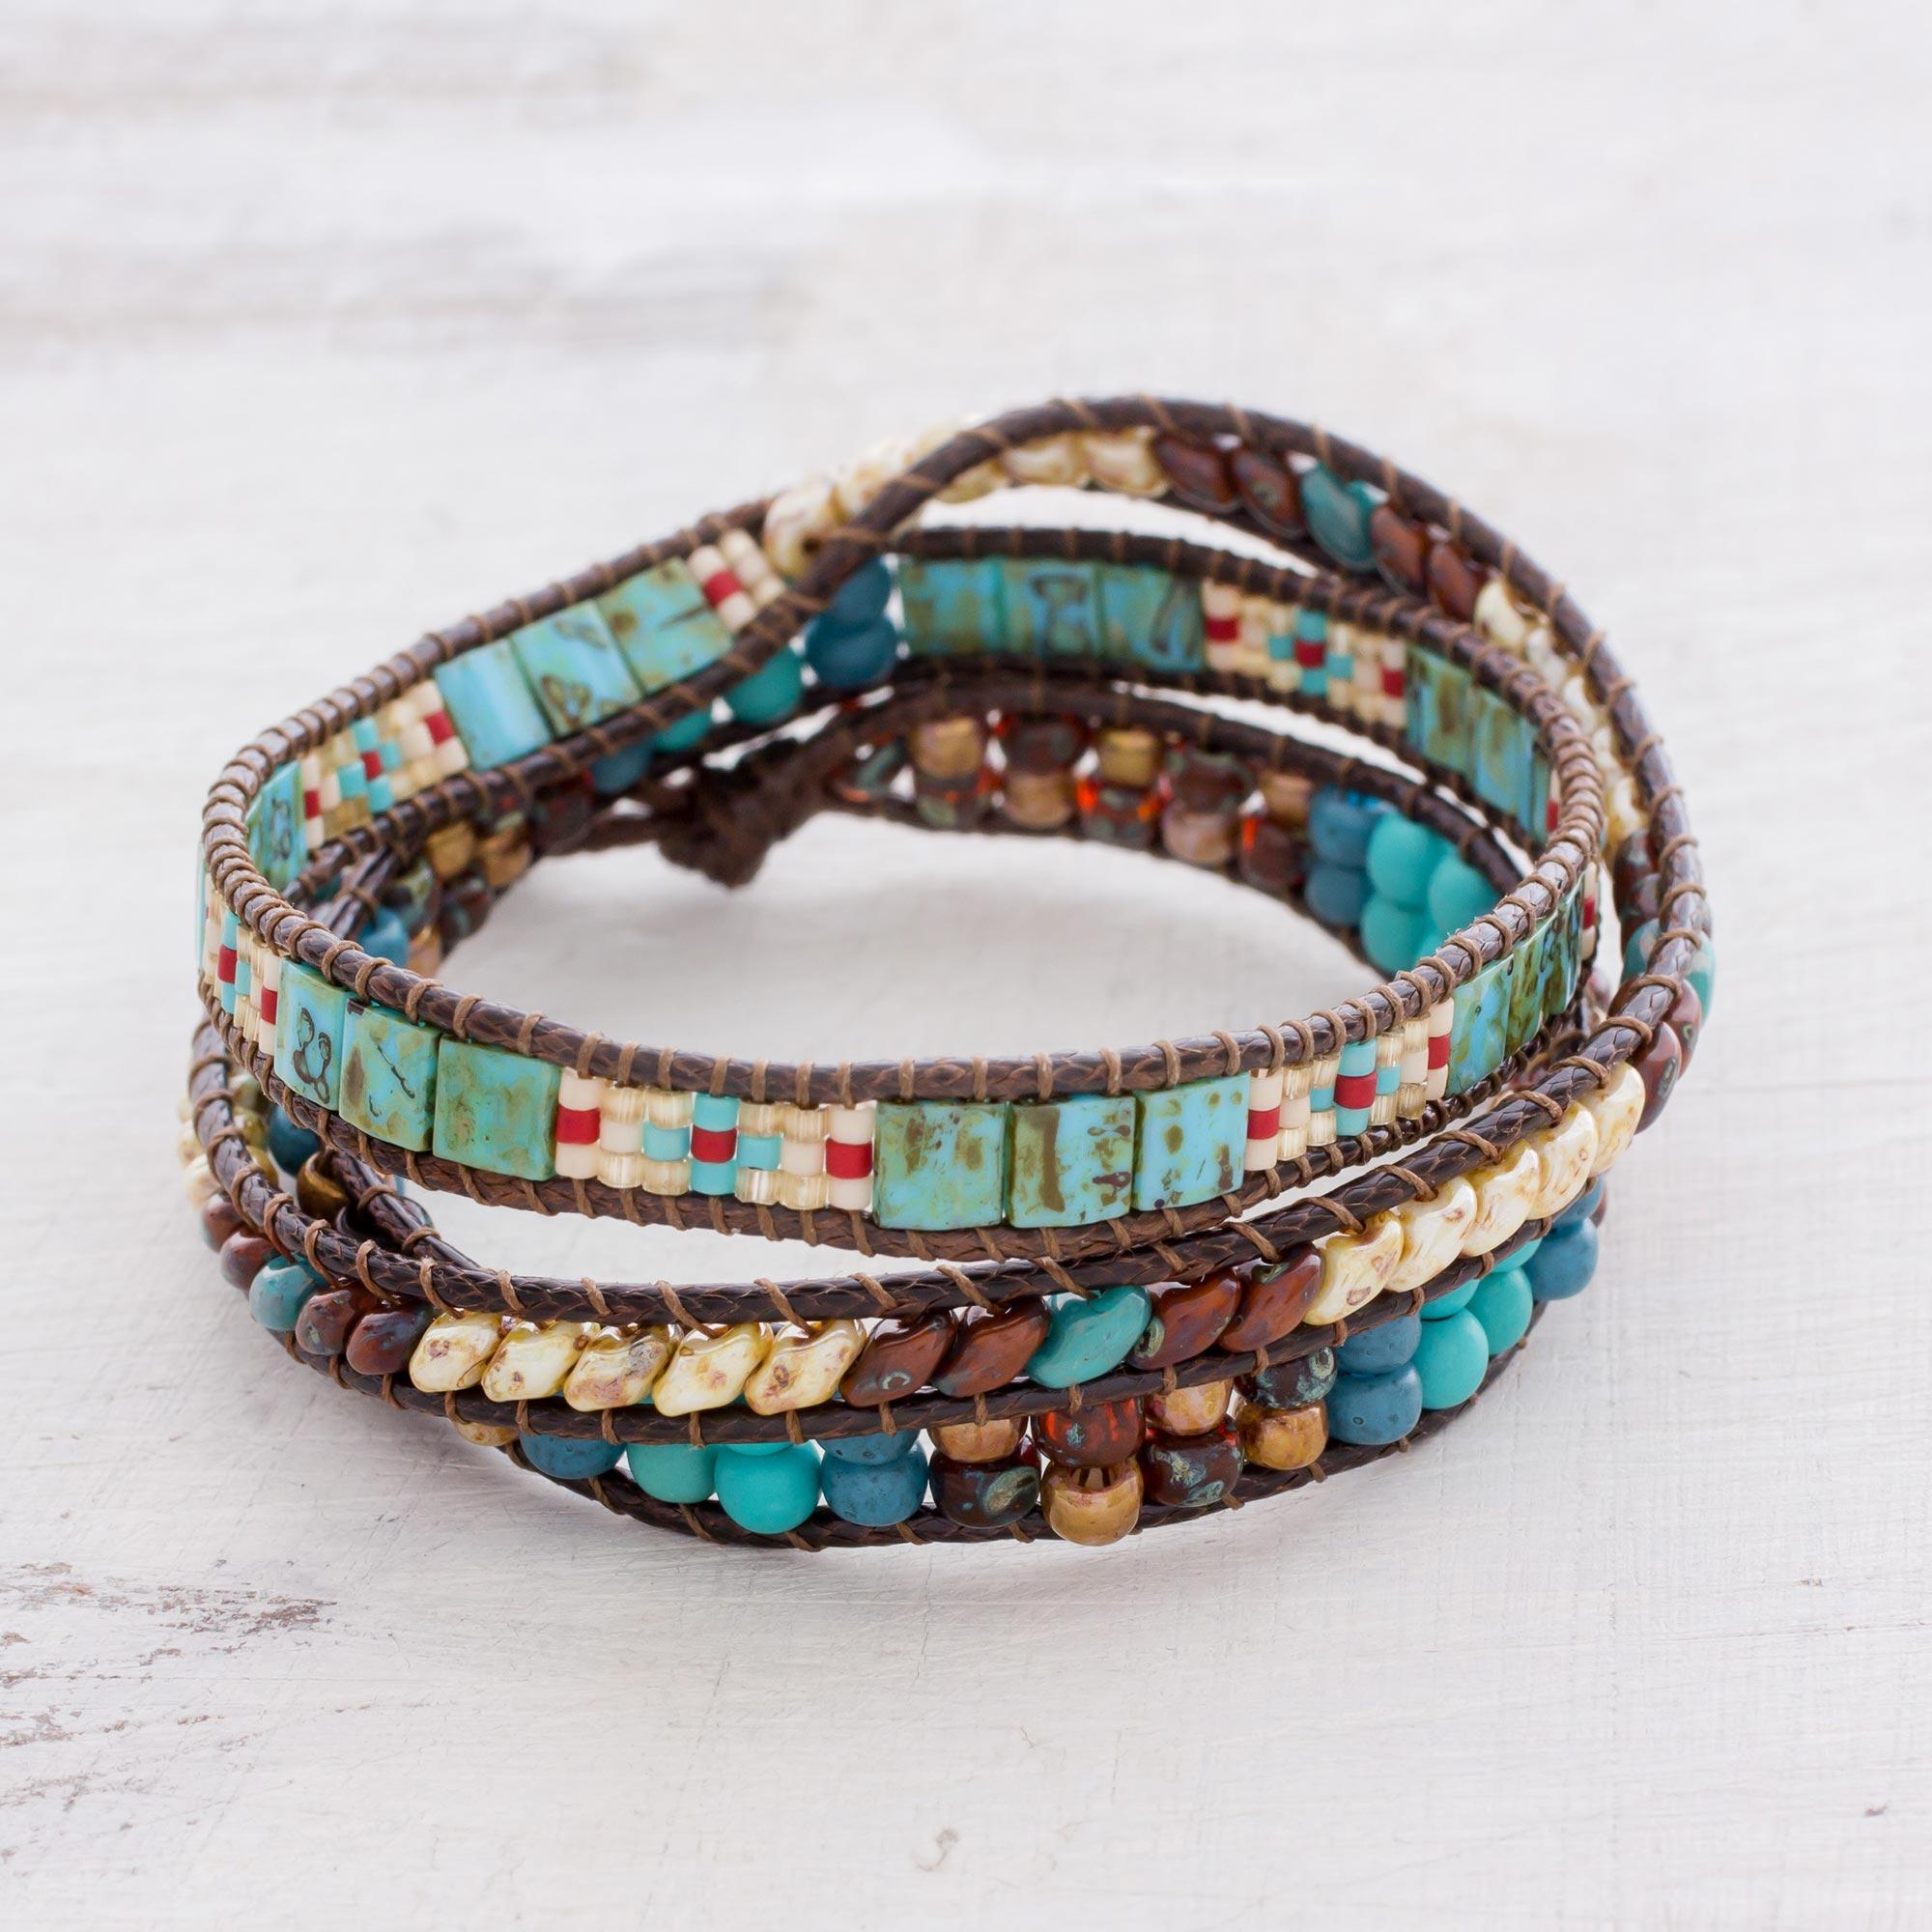 Handmade Gl Beaded Wrap Bracelet From Guatemala Santiago Alan Adventure